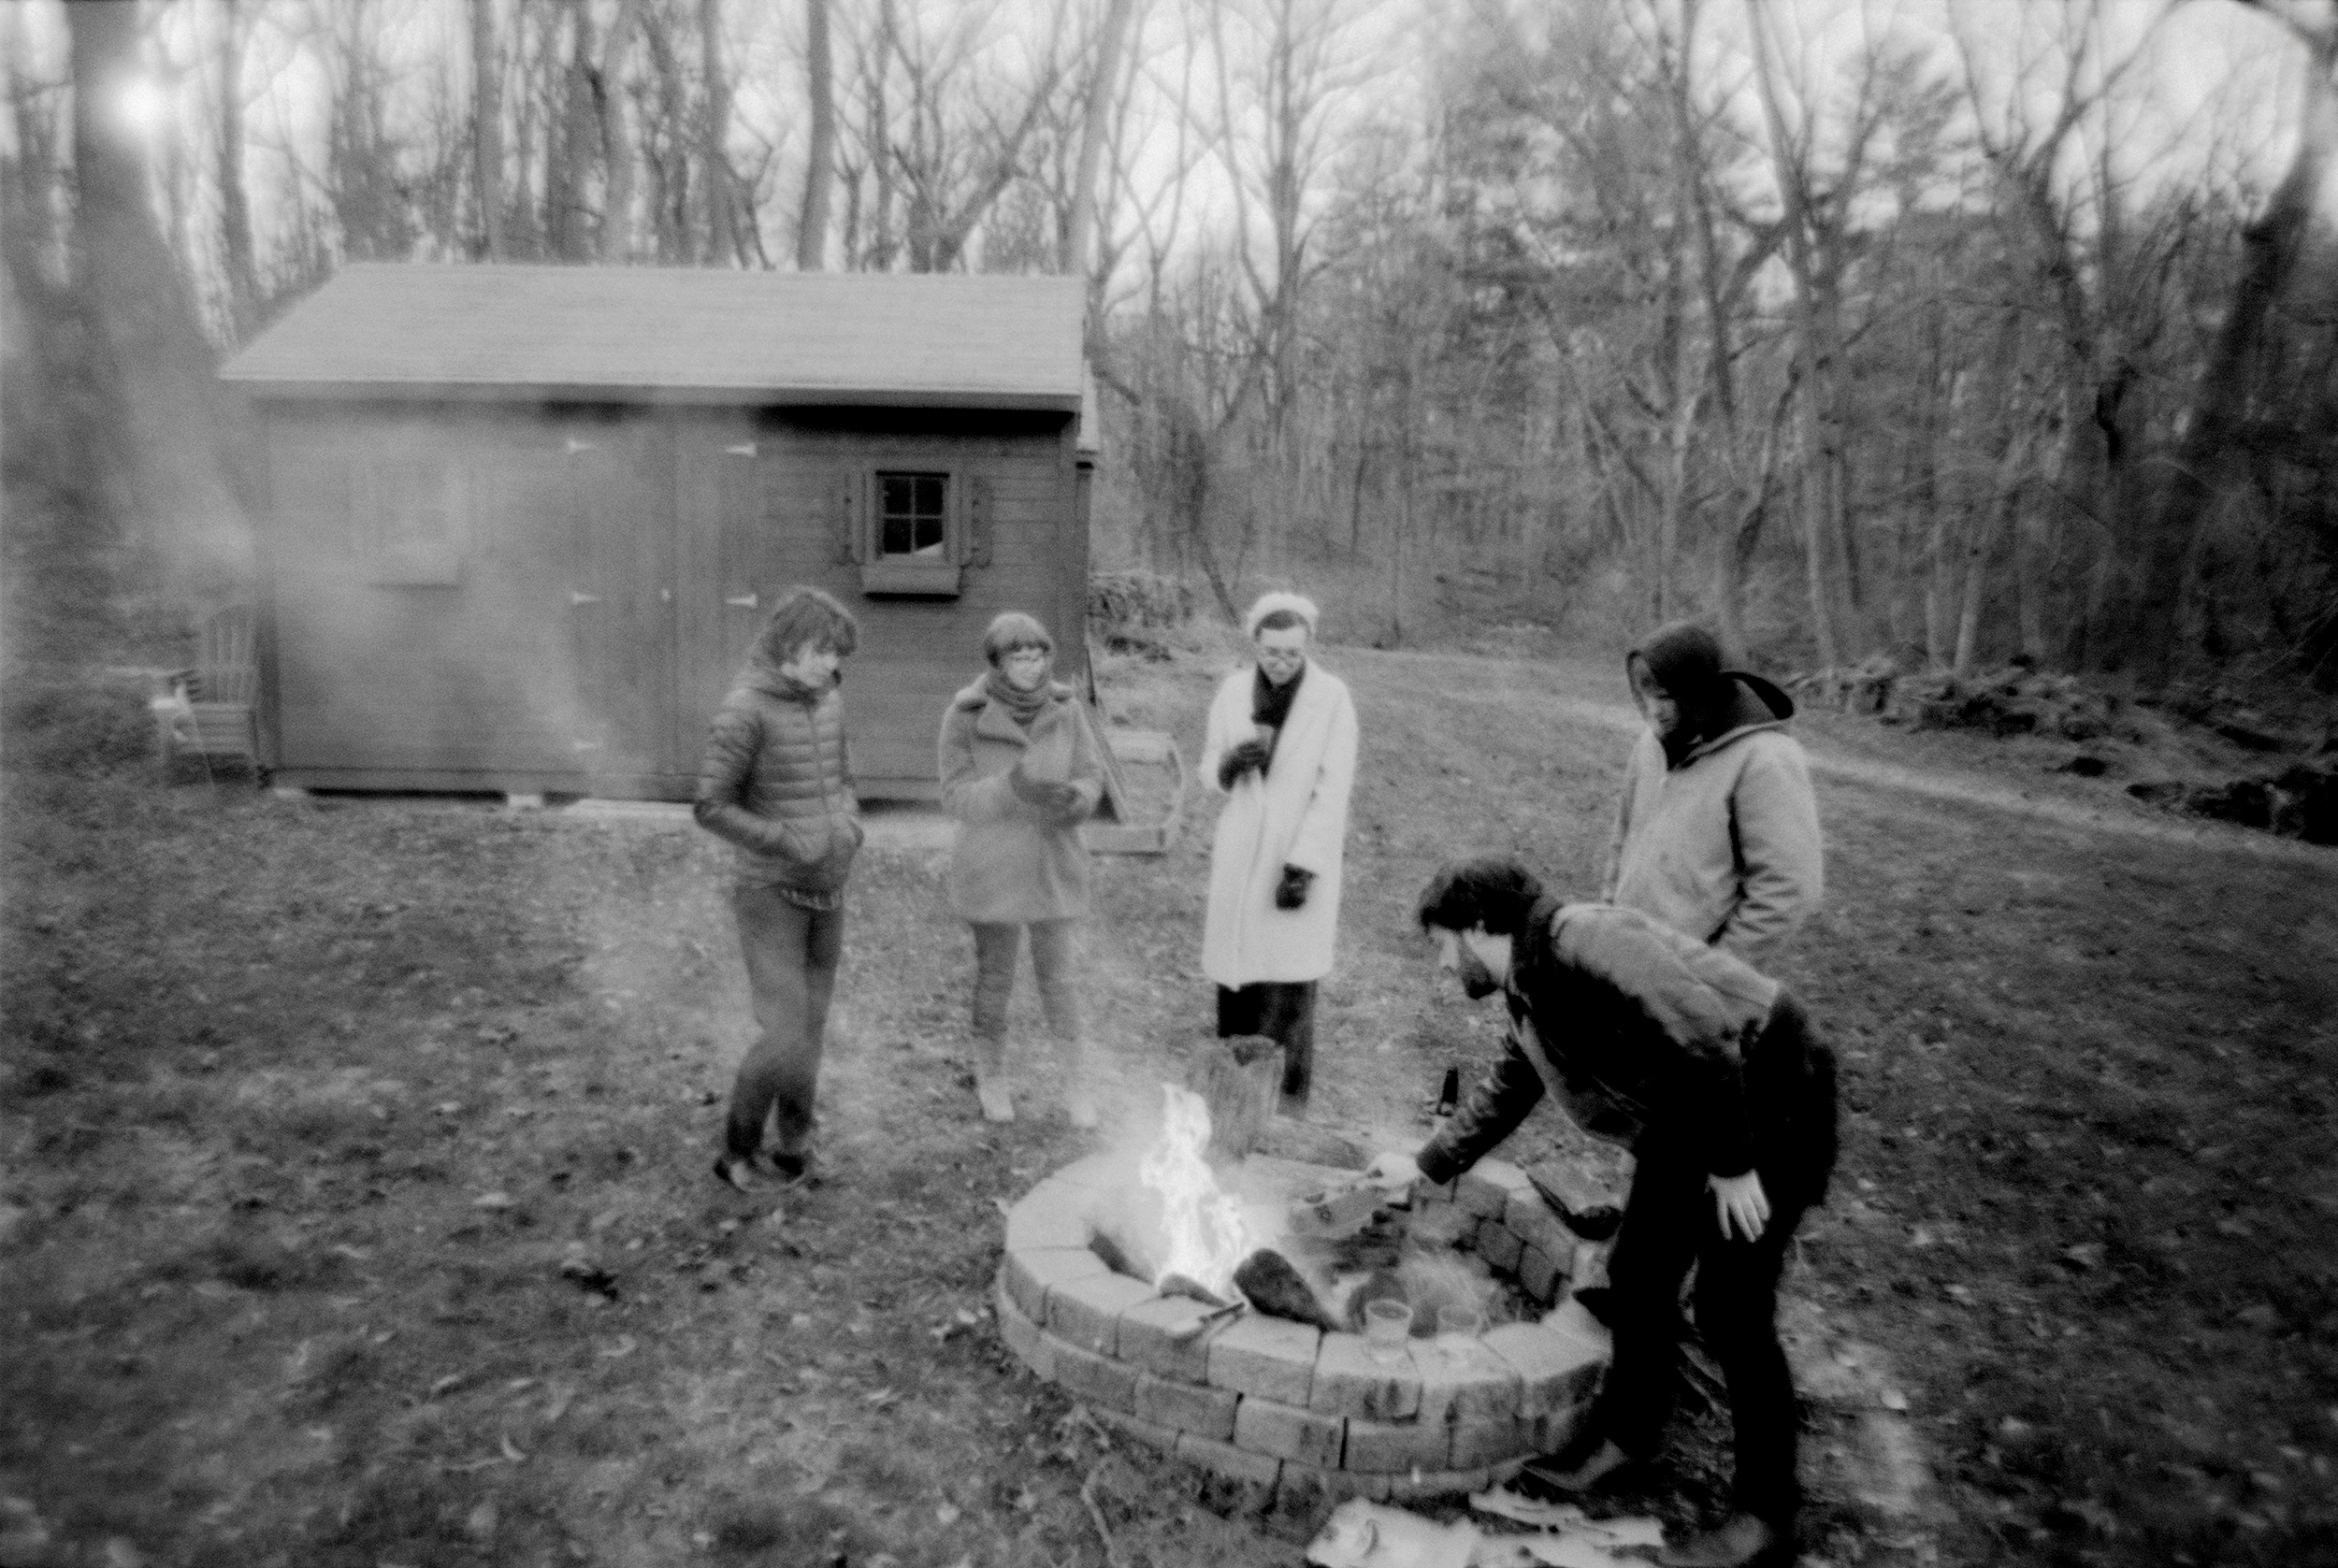 A creepy fire, Thanksgiving 2018